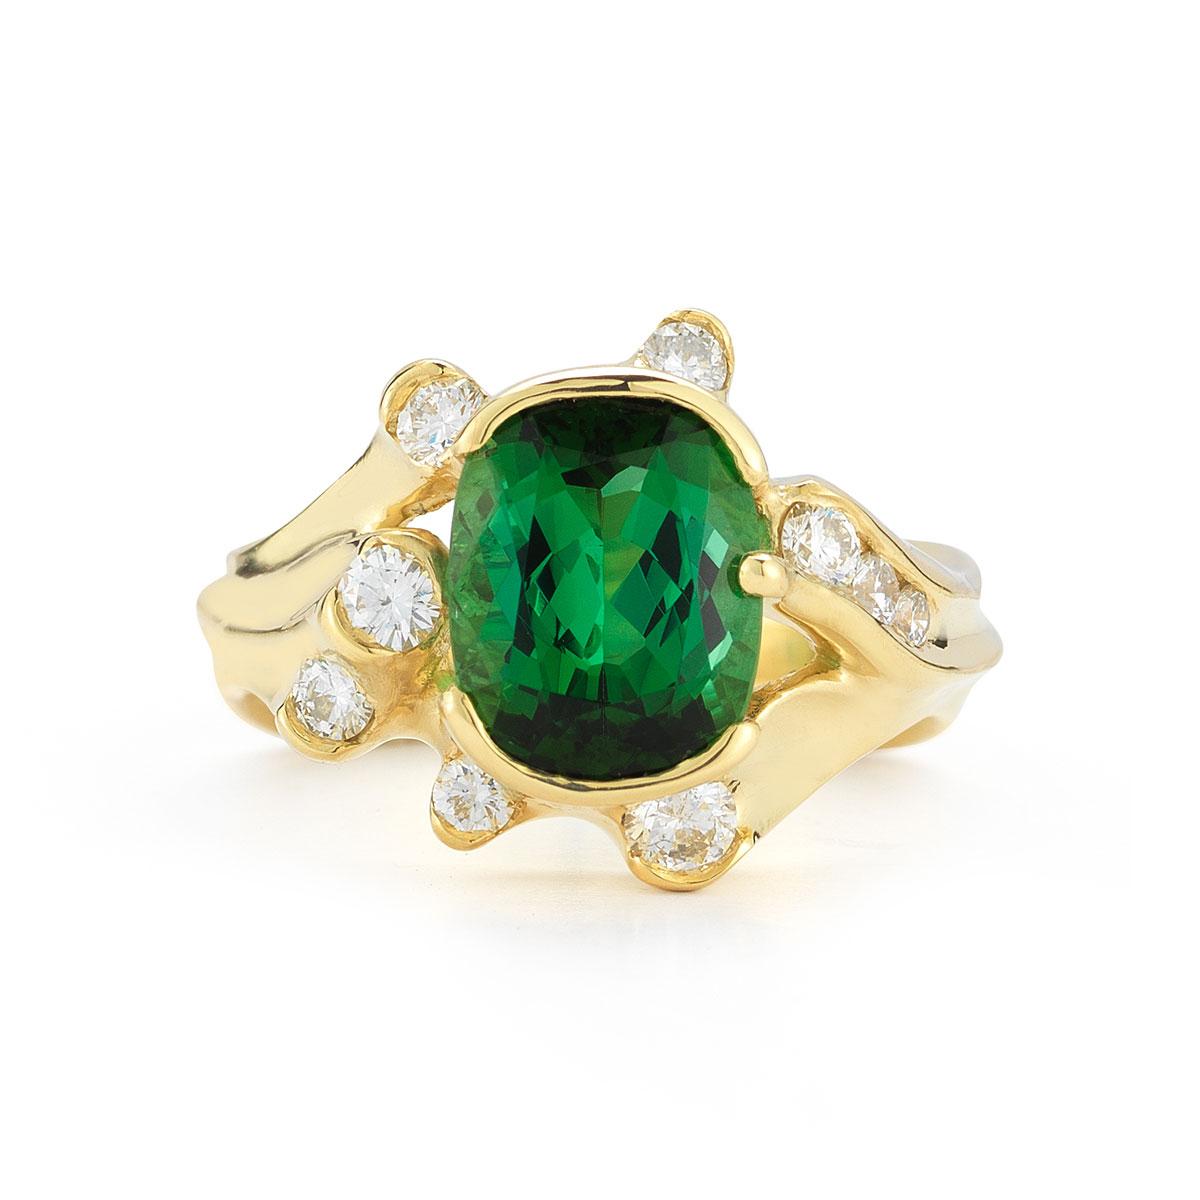 IND0976 Green Tourmaline Ring